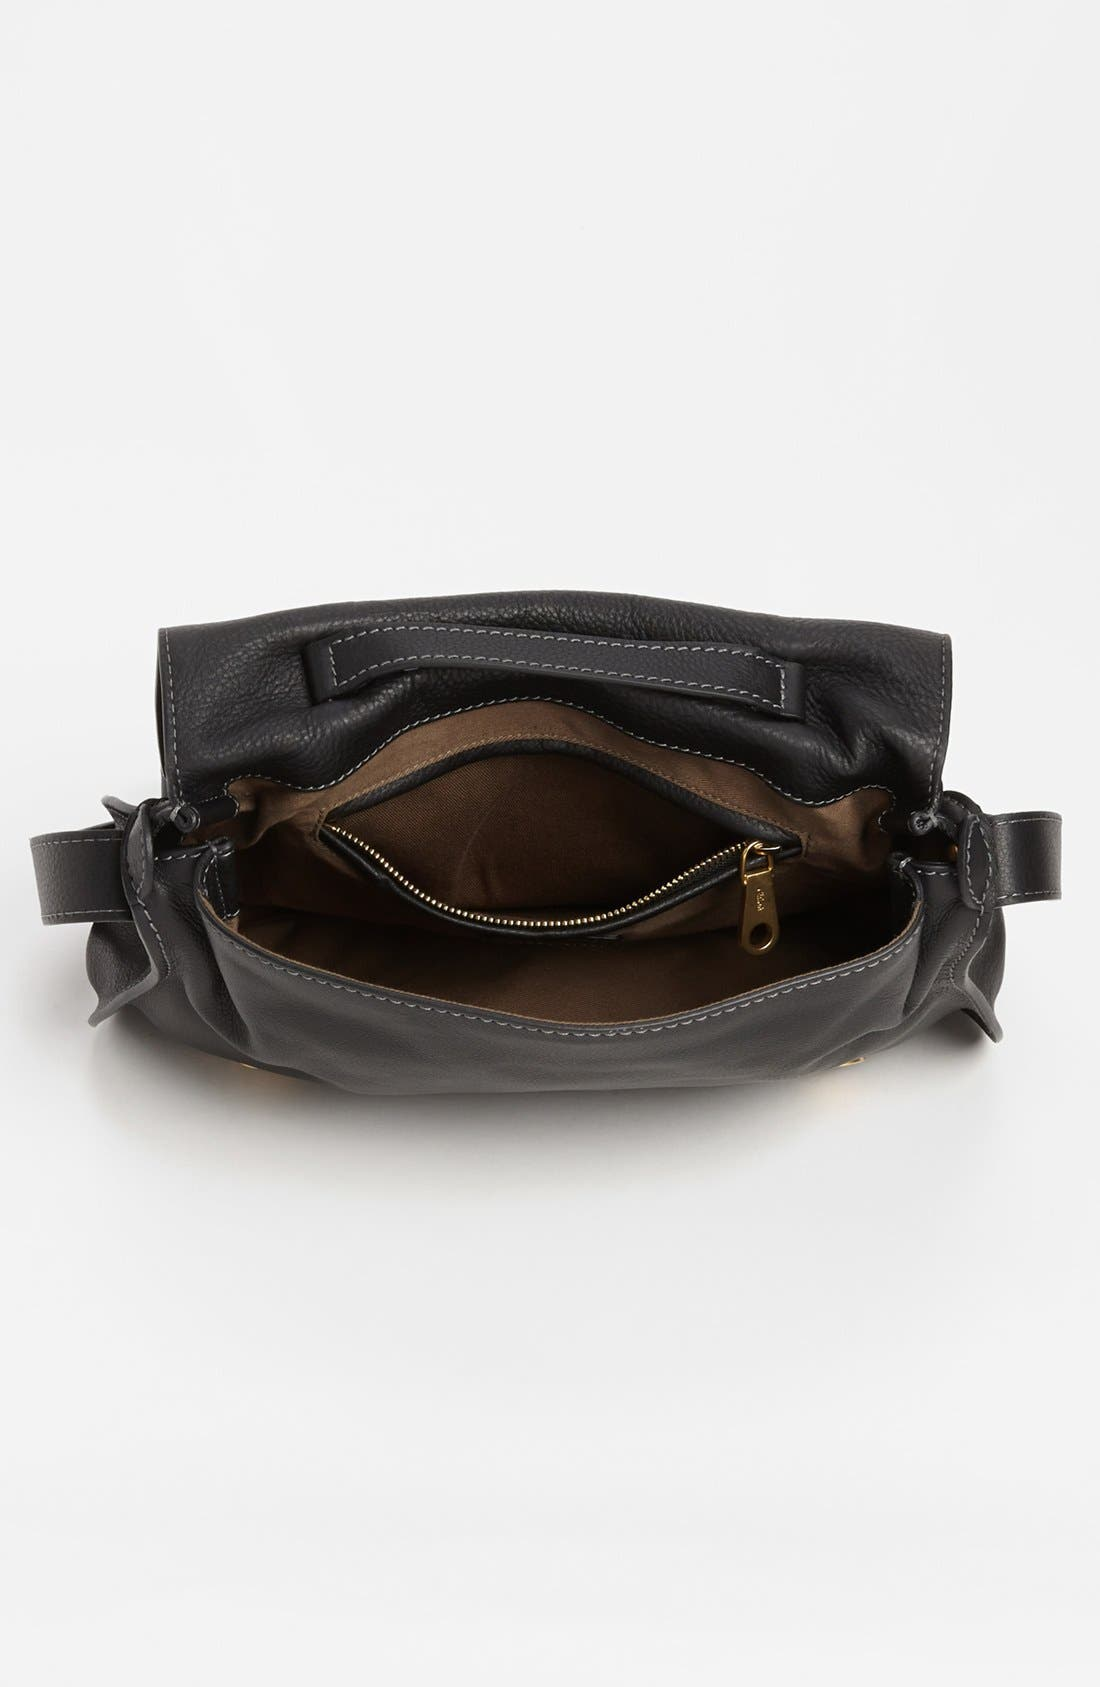 Alternate Image 3  - Chloé 'Marcie' Top Handle Leather Satchel